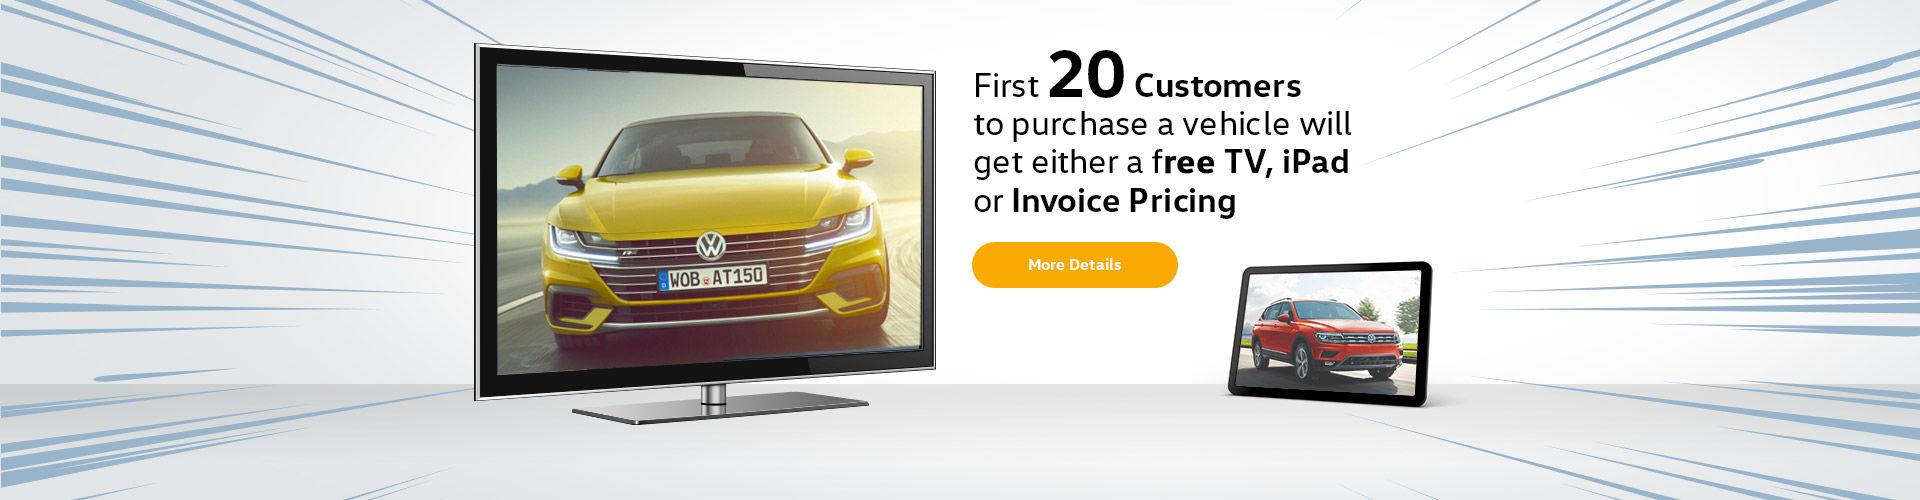 Free TV, iPad  or Invoice Pricing